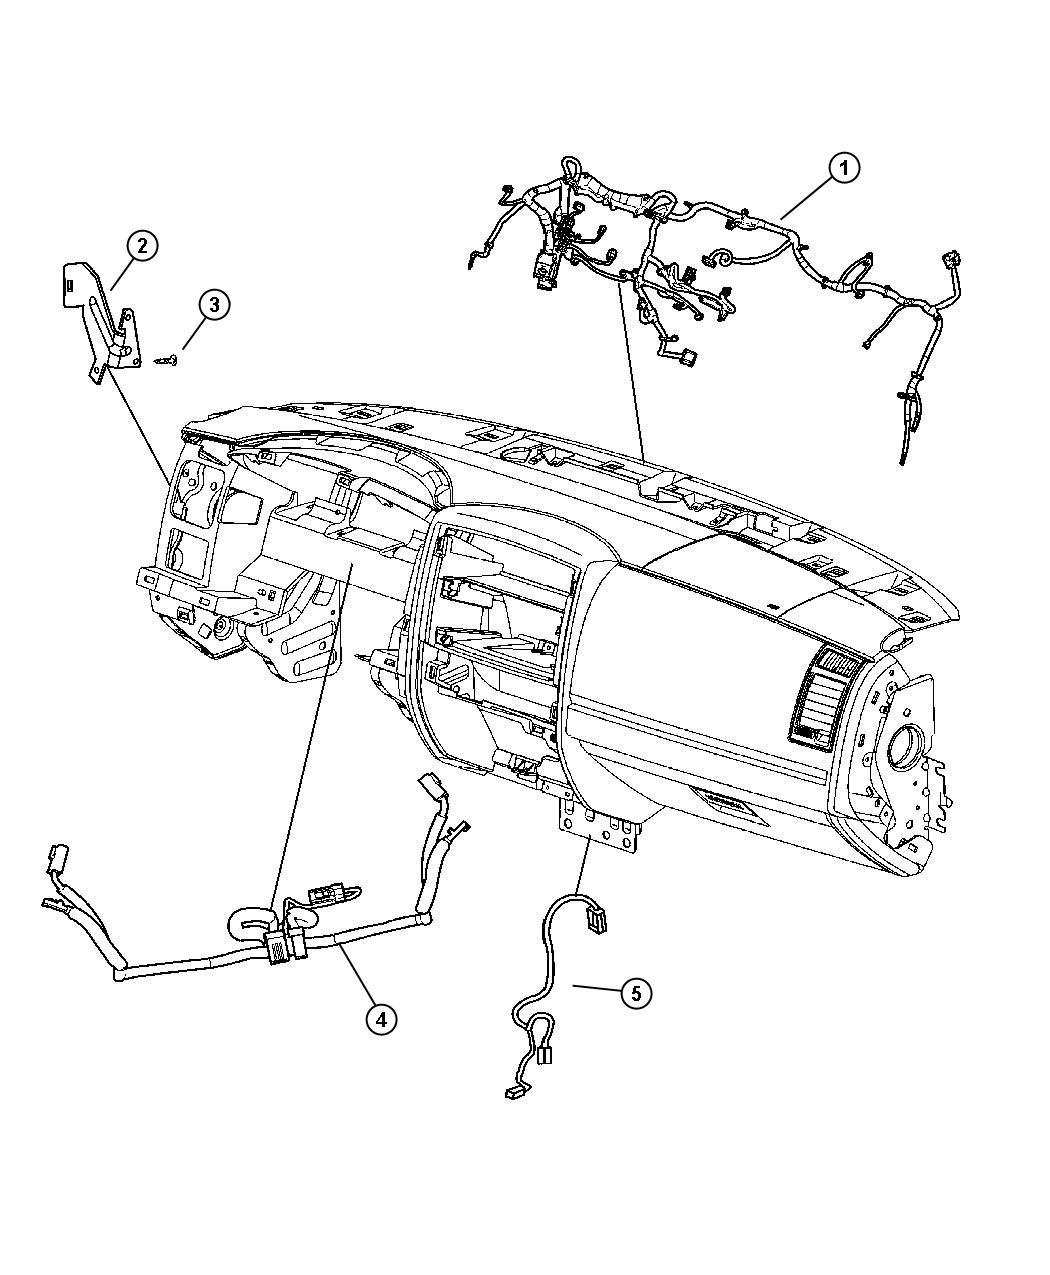 Dodge Dakota Slt Quad Cab 4 7l V8 A T 4x2 Wiring